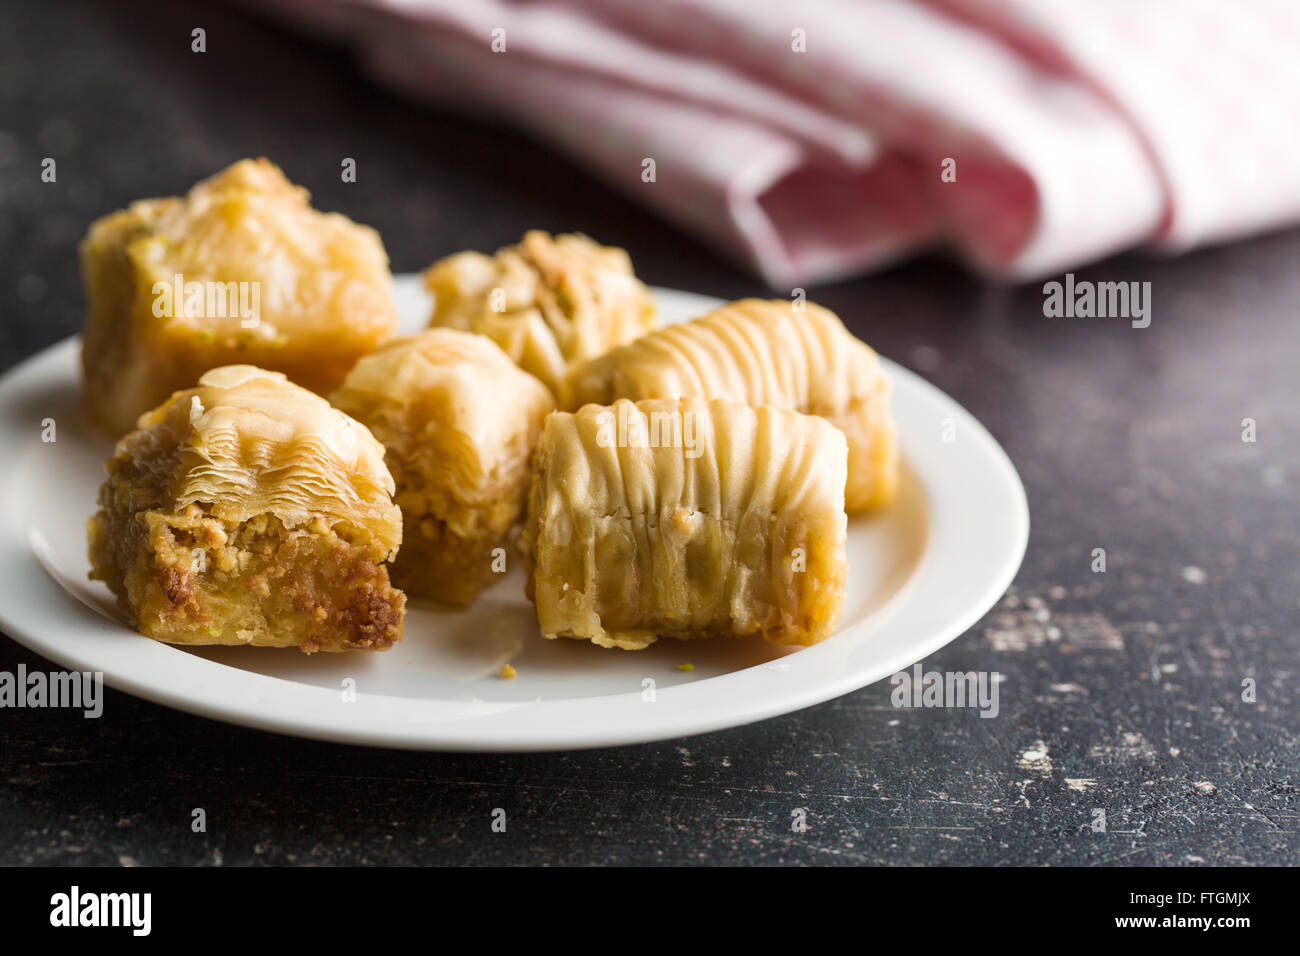 süße Baklava Dessert auf Platte Stockbild